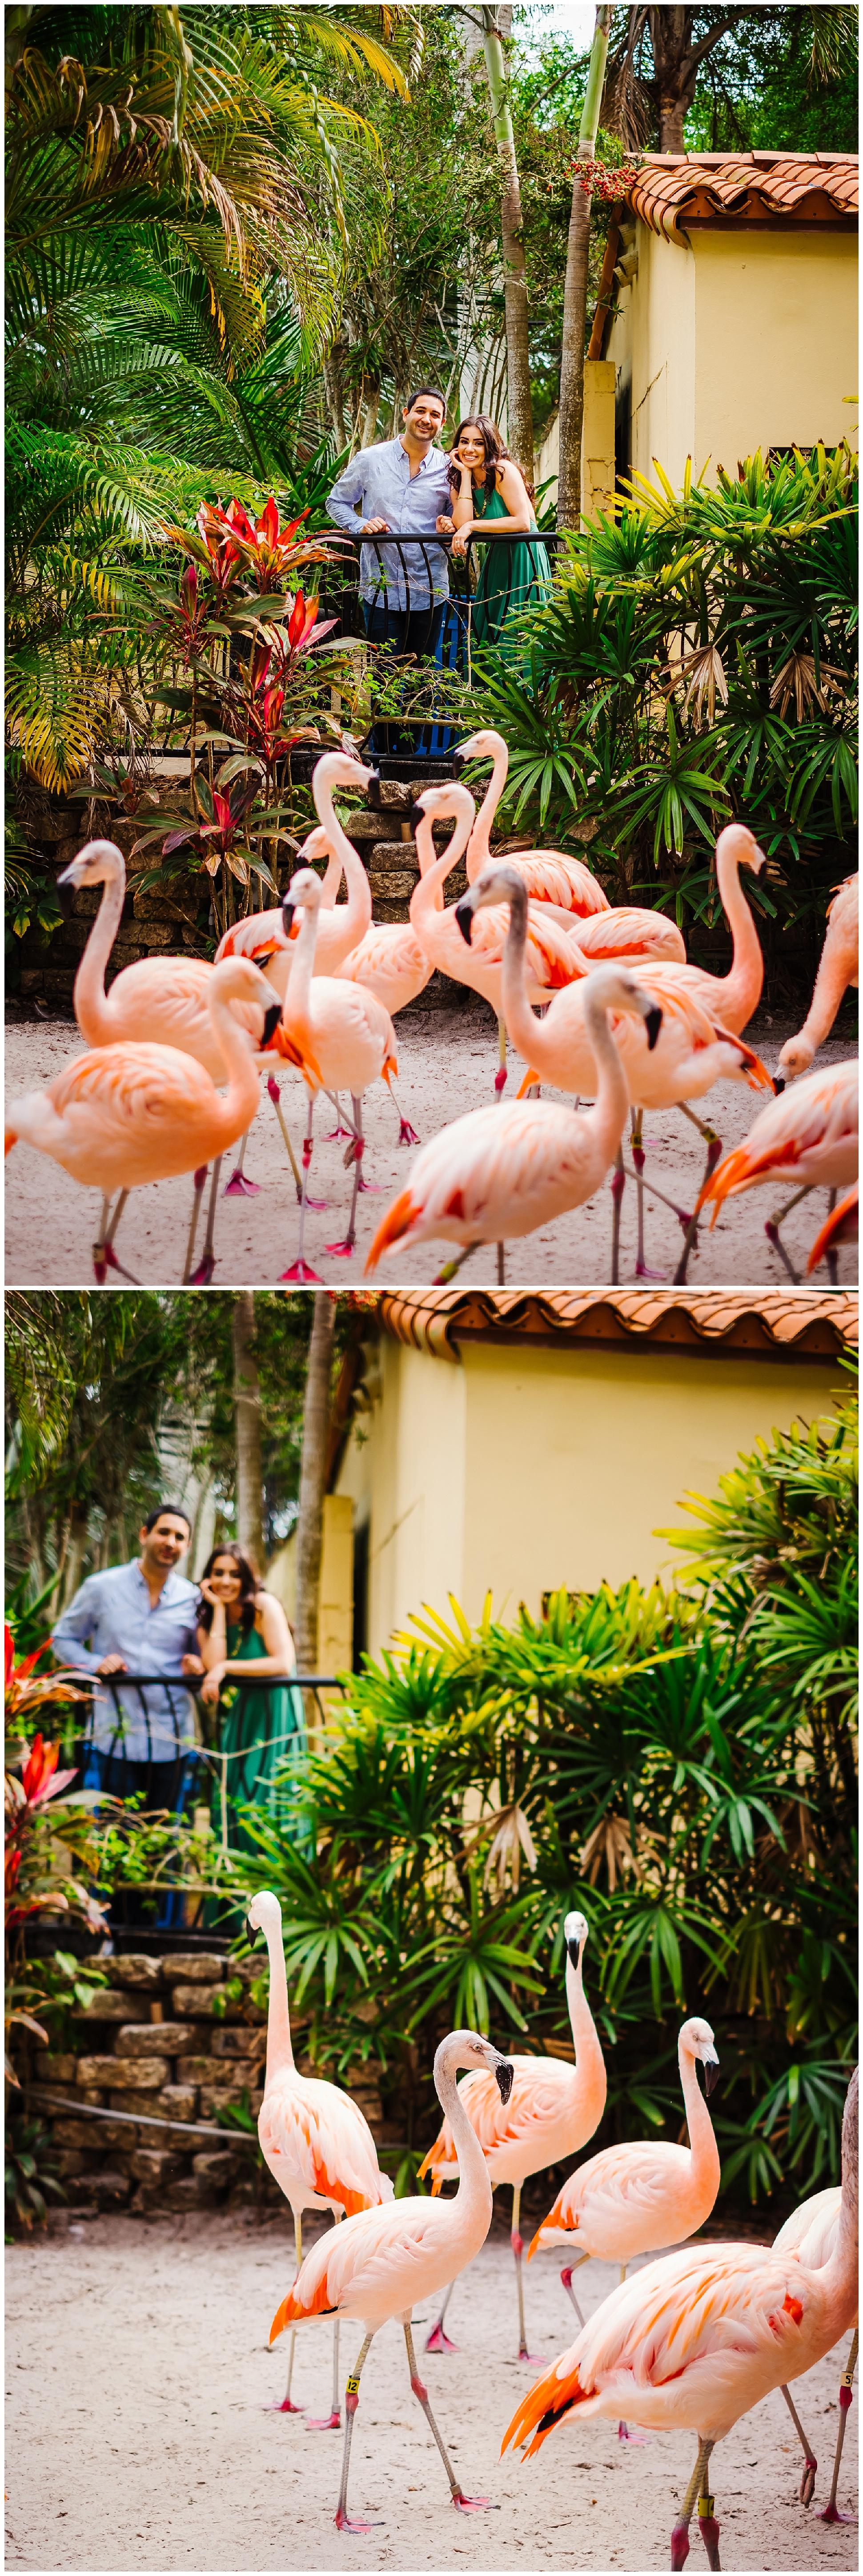 sunken-gardens-engagement-session-photos-teal-flamingos_0017.jpg